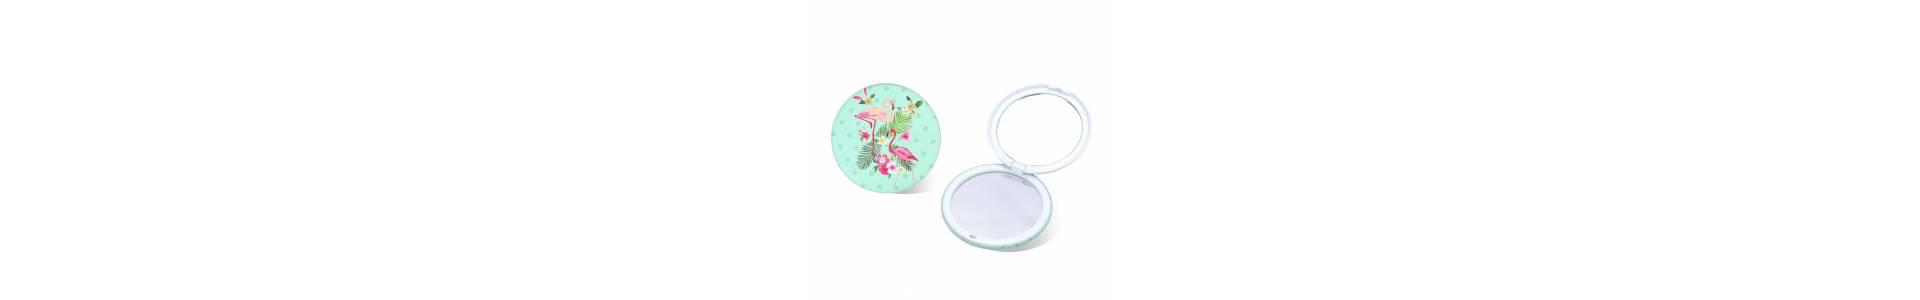 ▷ Comprar  espejos detalles de bodas | Regalantes